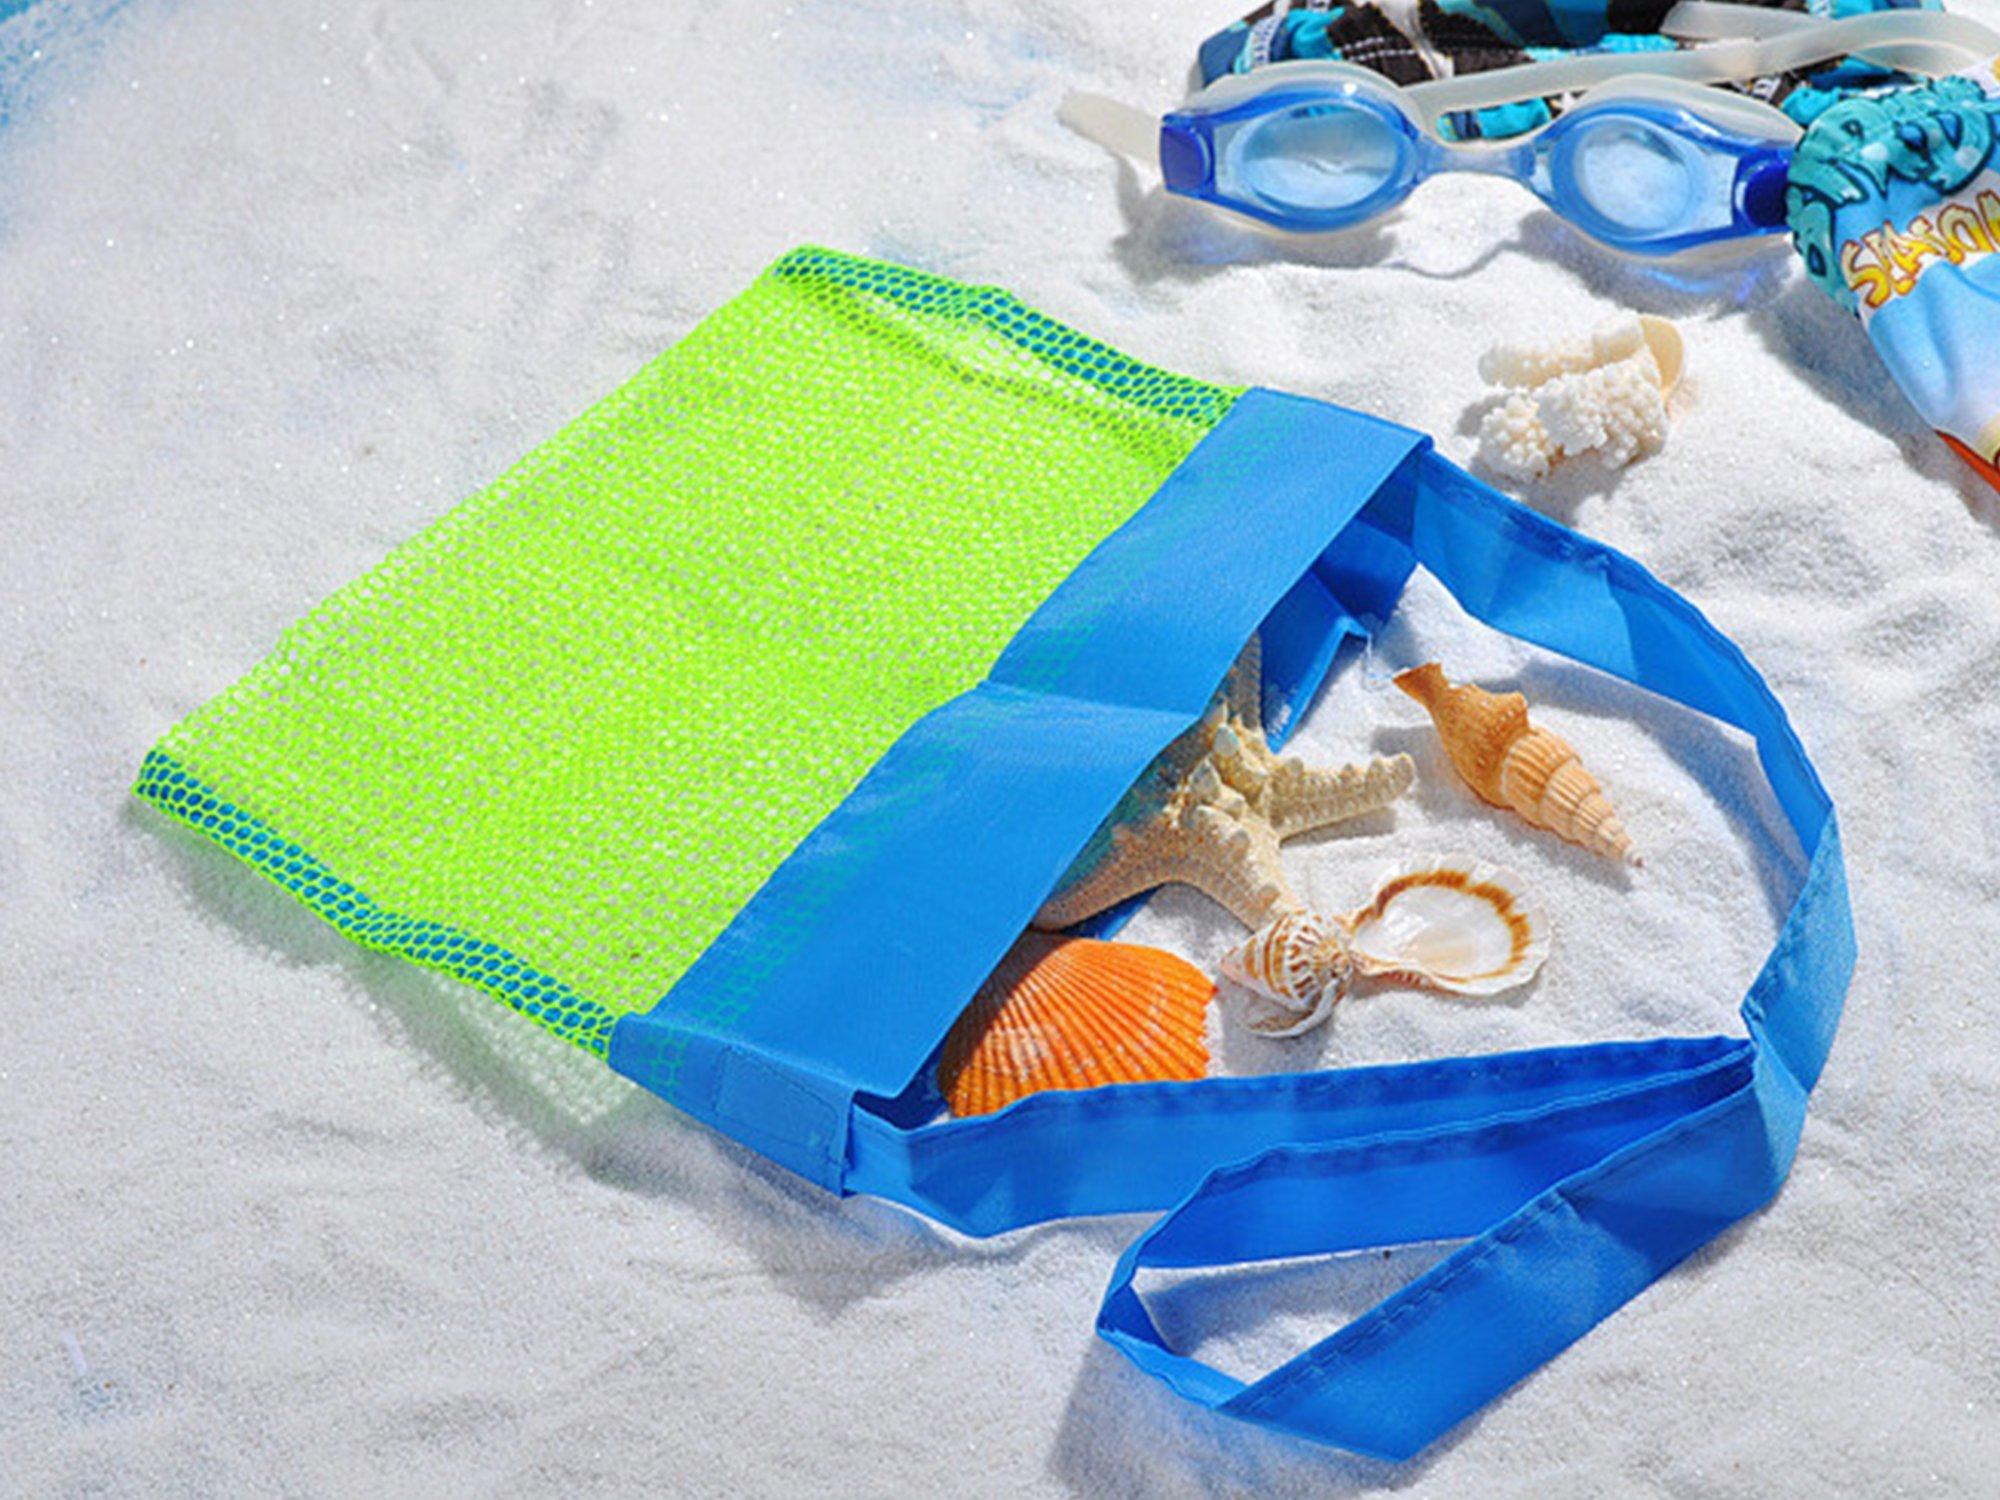 MODARANI Kid's Small Mesh Beach Bag Water Toy Tote Bag Crossbody Travel Bag for Boys Girls by MODARANI (Image #3)